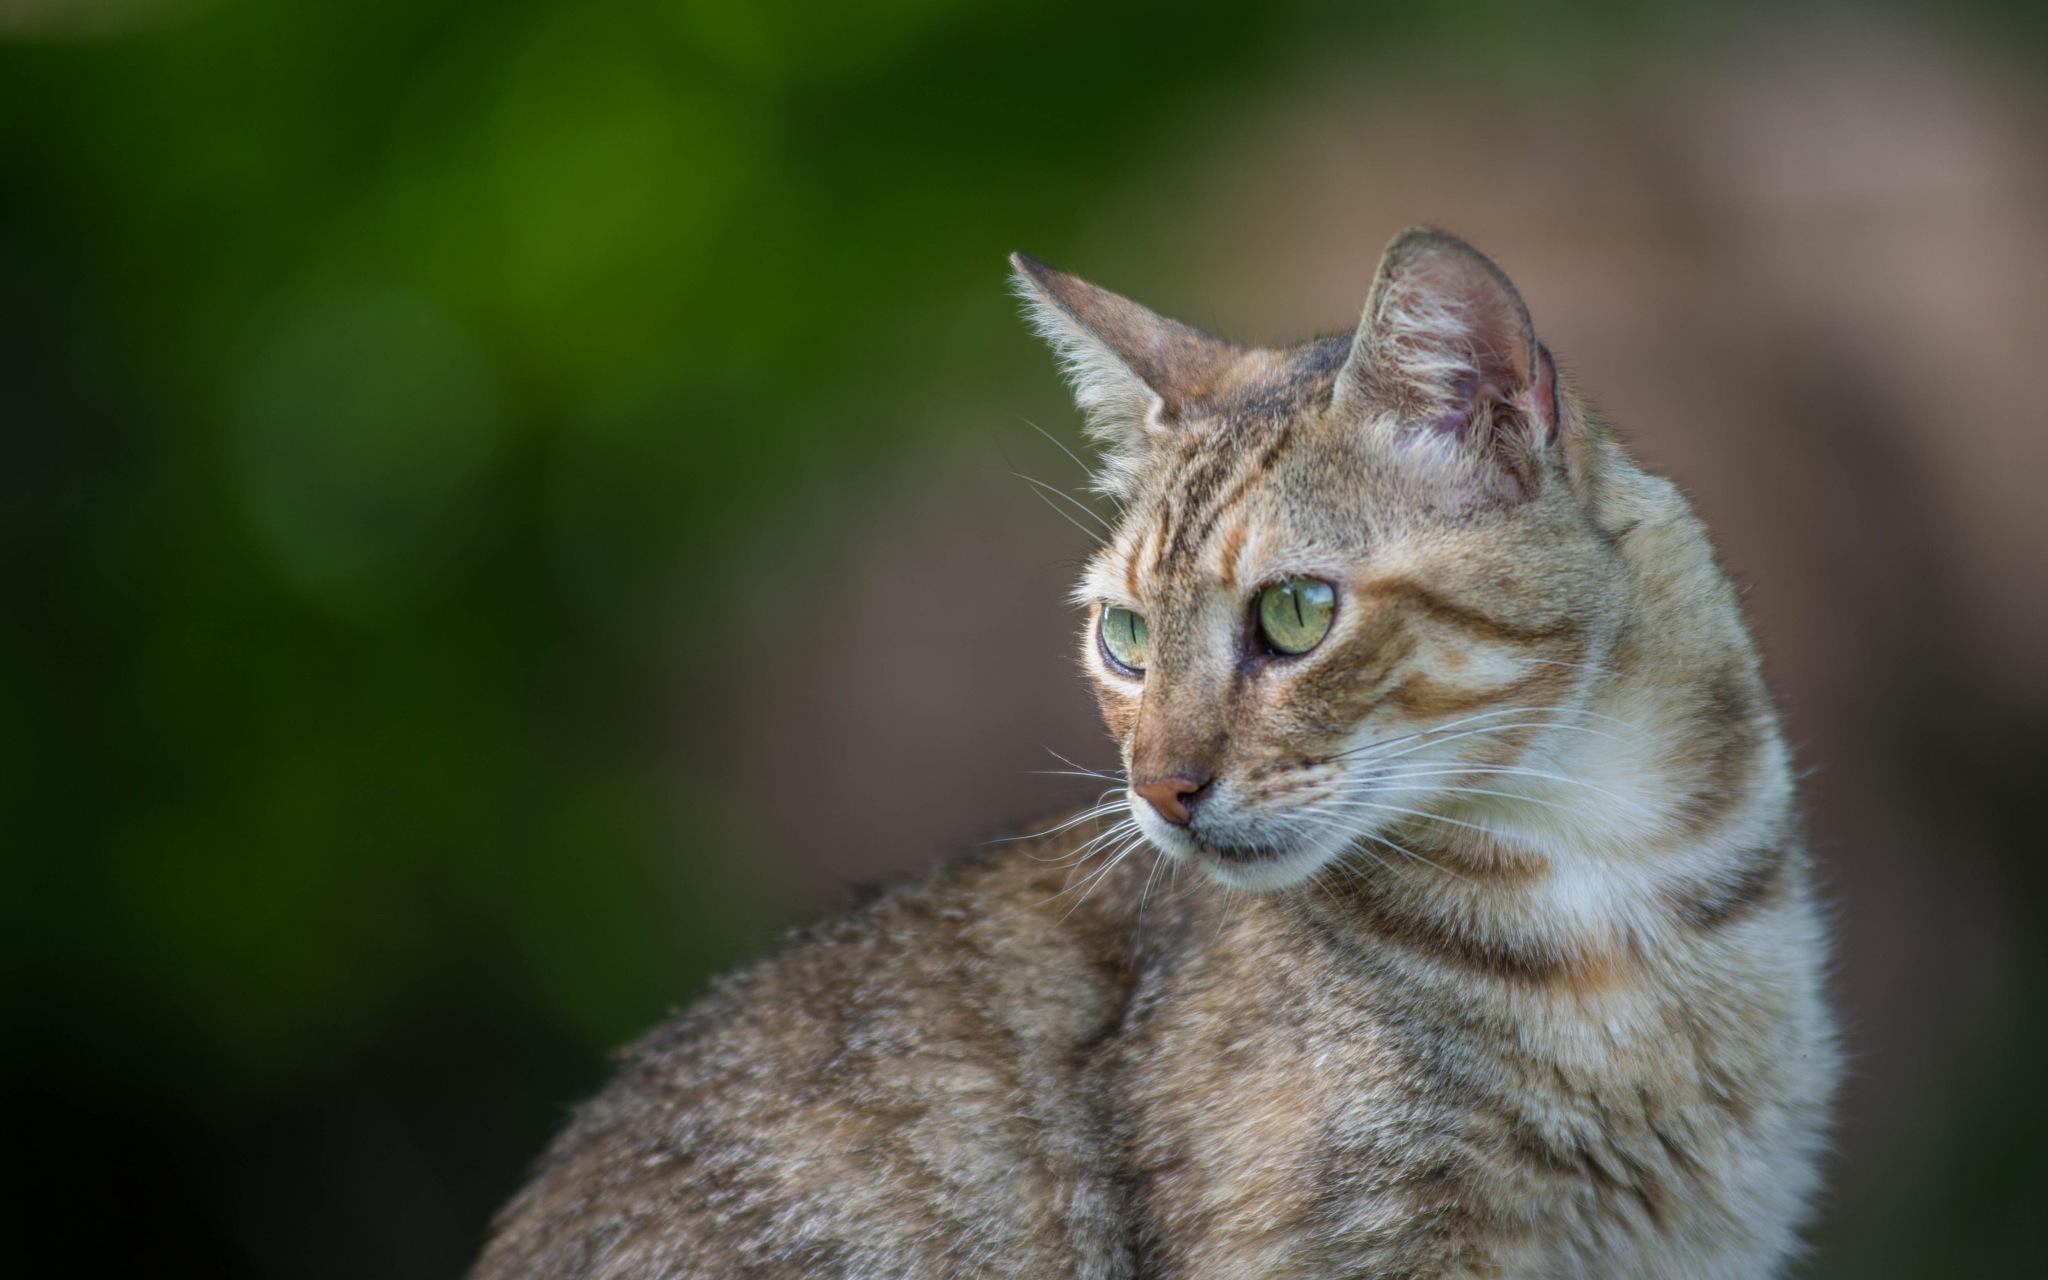 cat by Vlado Ferencic